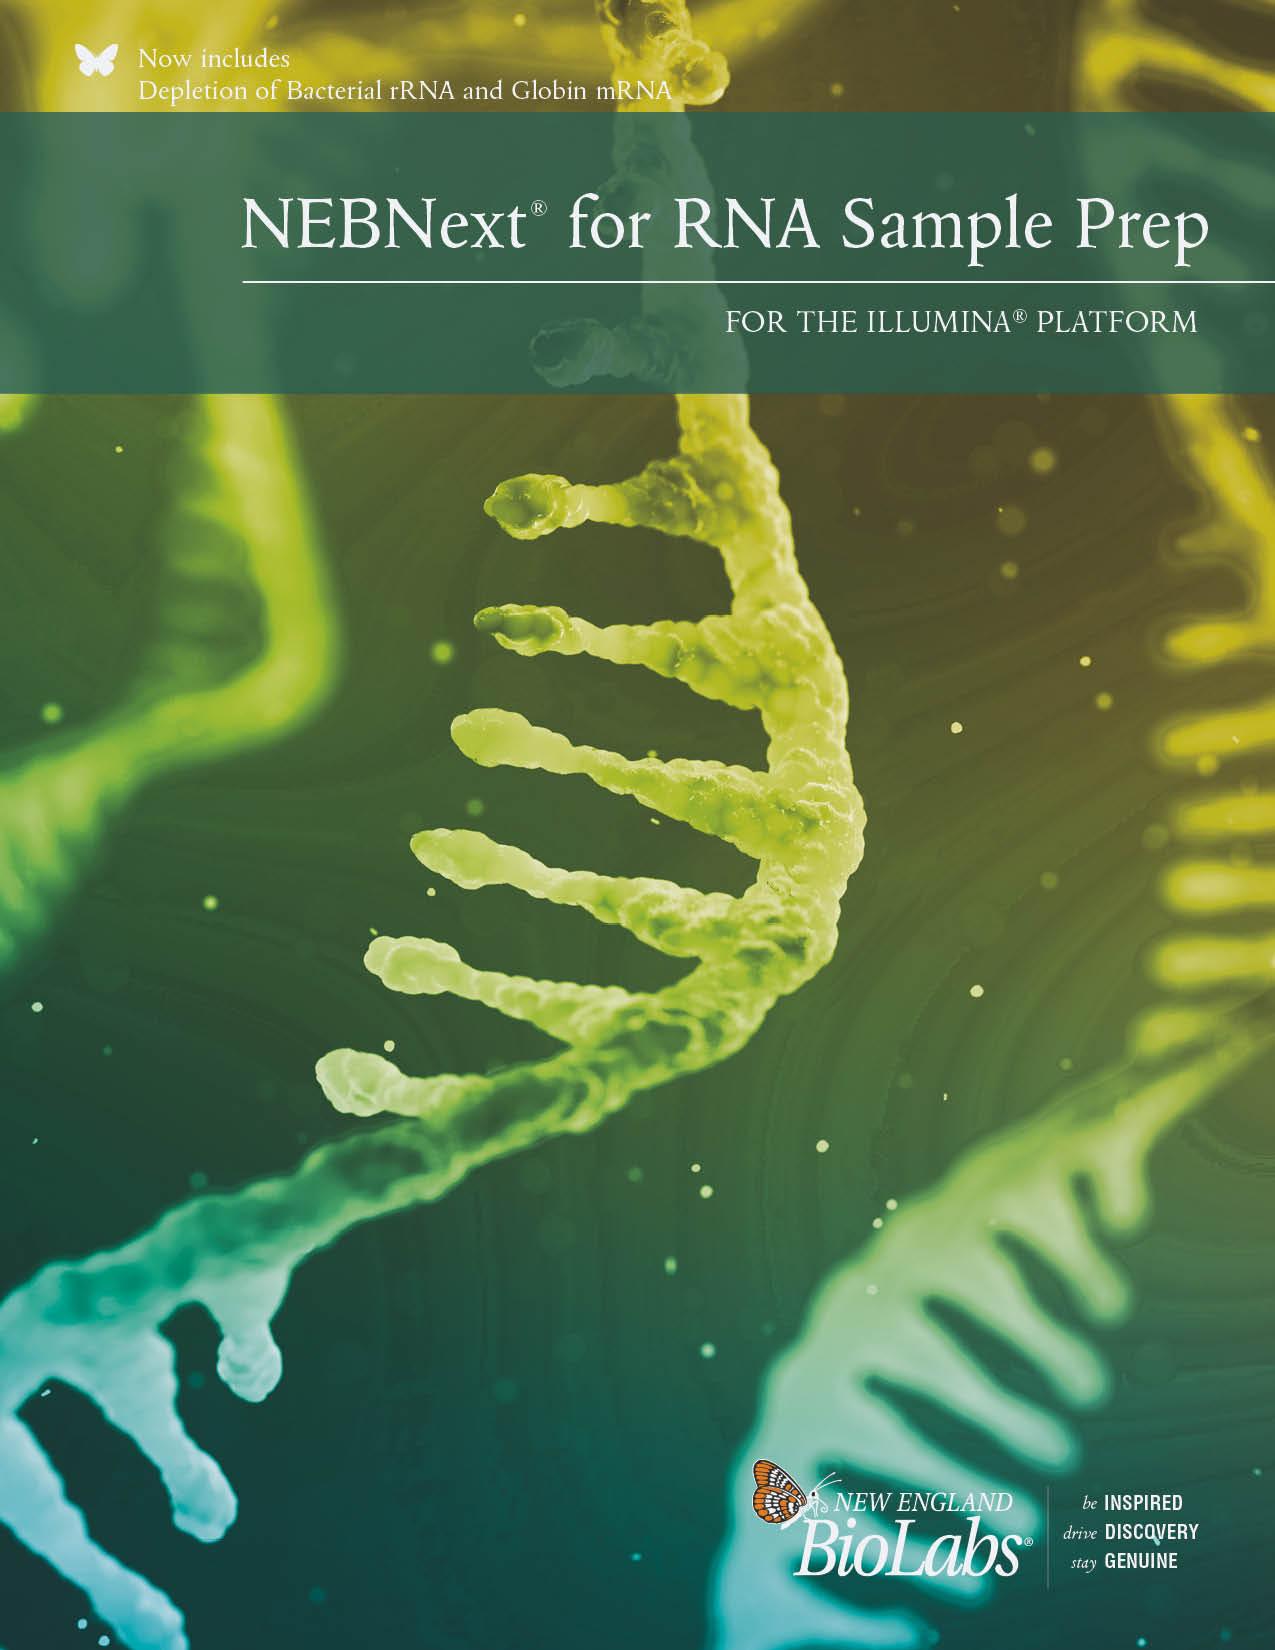 NEBNext RNA Illumina Broschüre